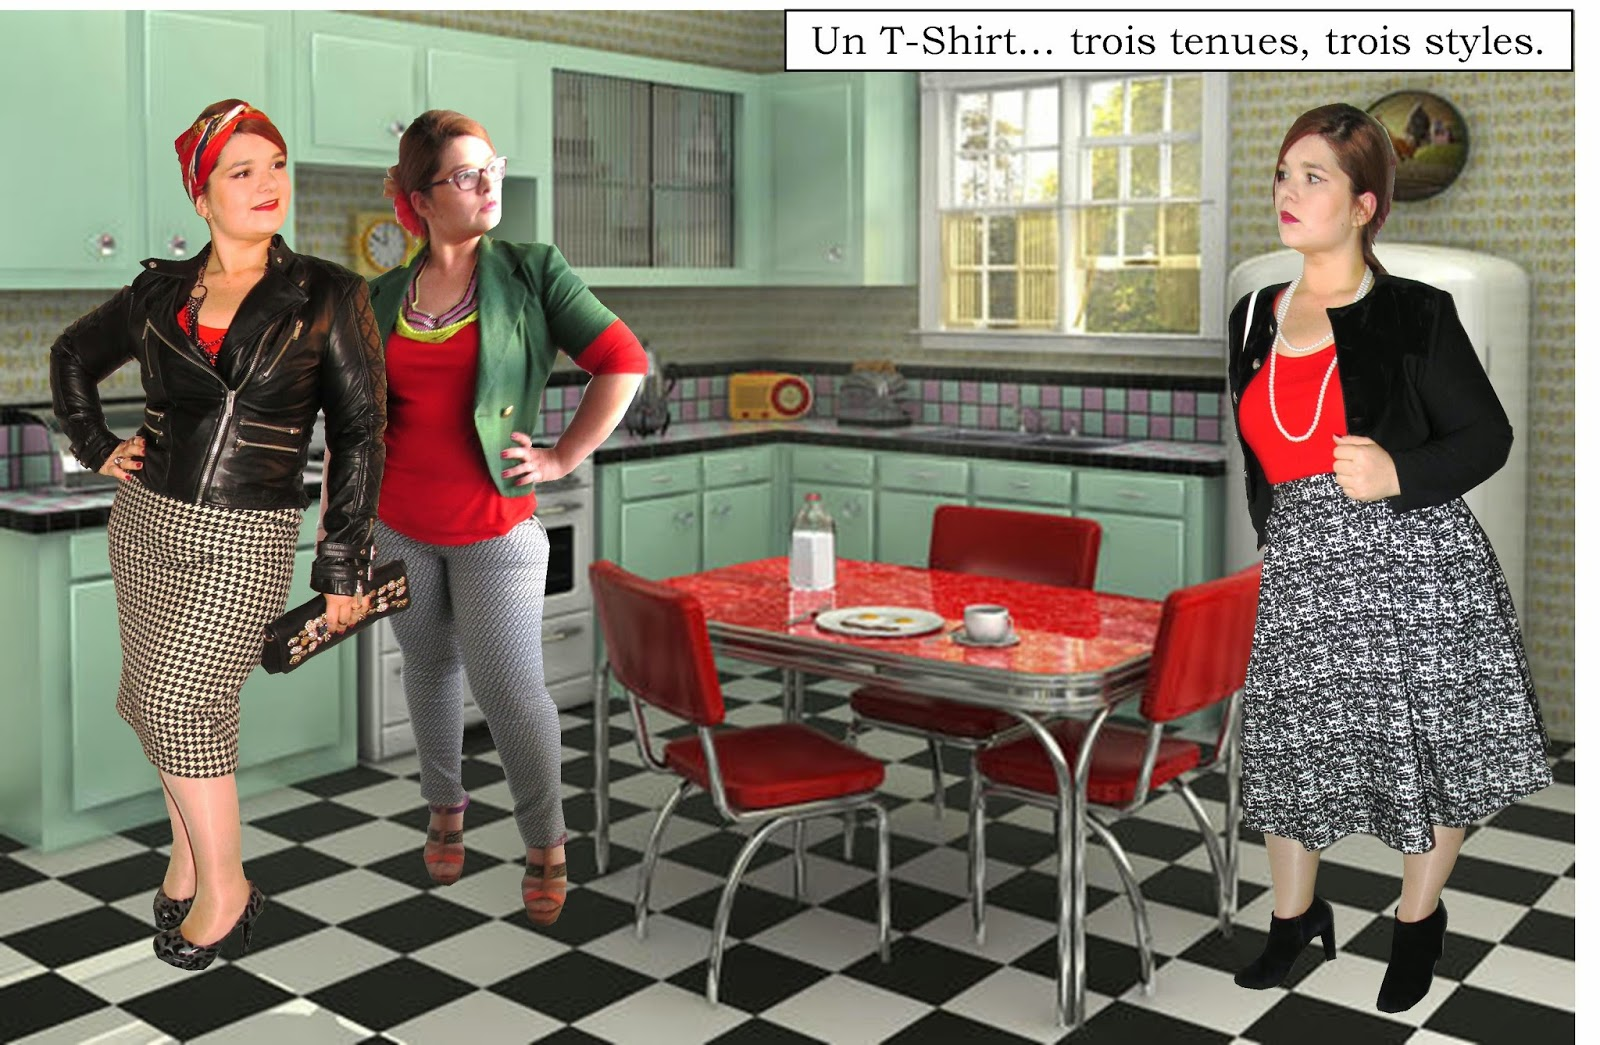 http://leslubiesdelulue.blogspot.fr/2014/09/french-curves-la-challenge-4-septembre.html